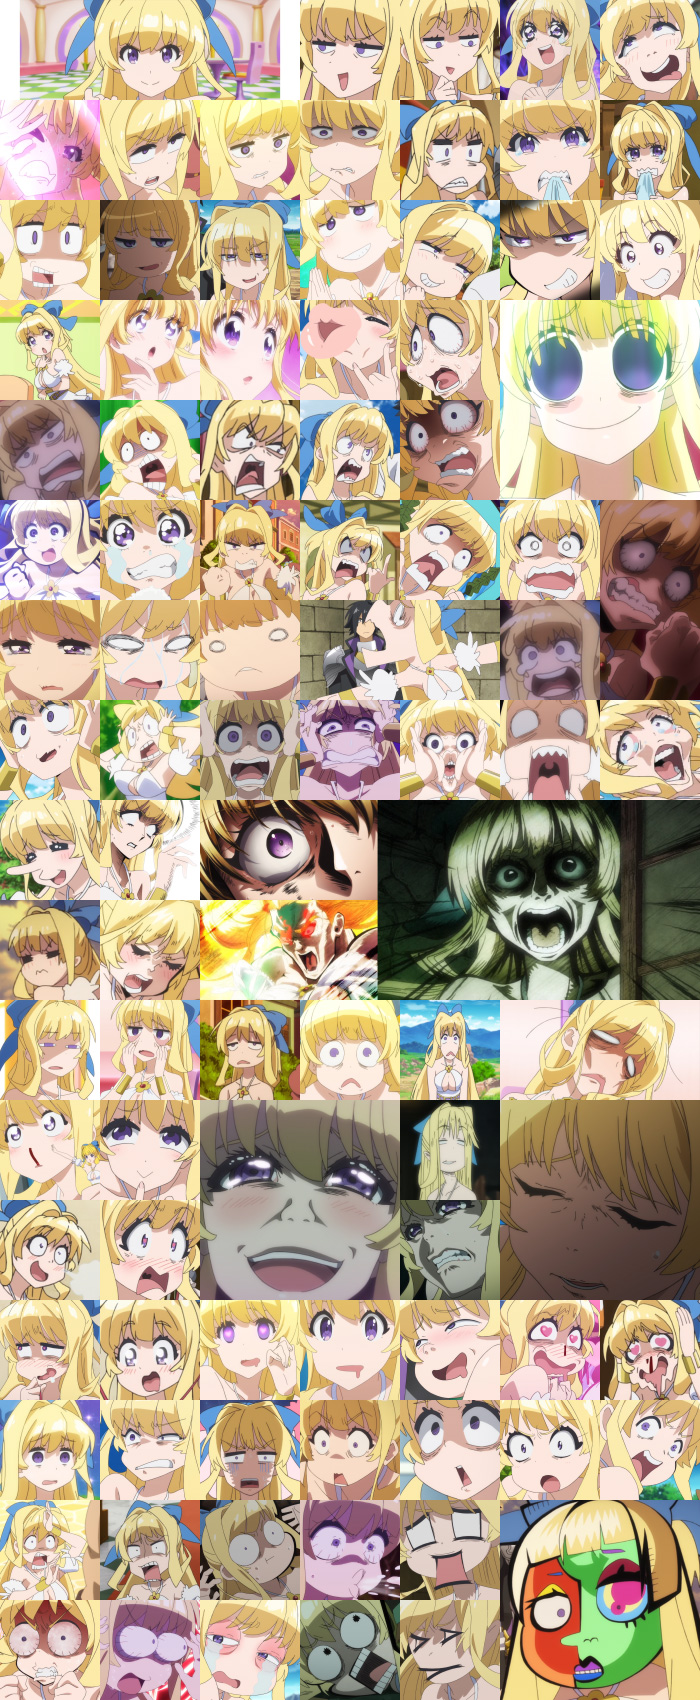 Ristarte's faces